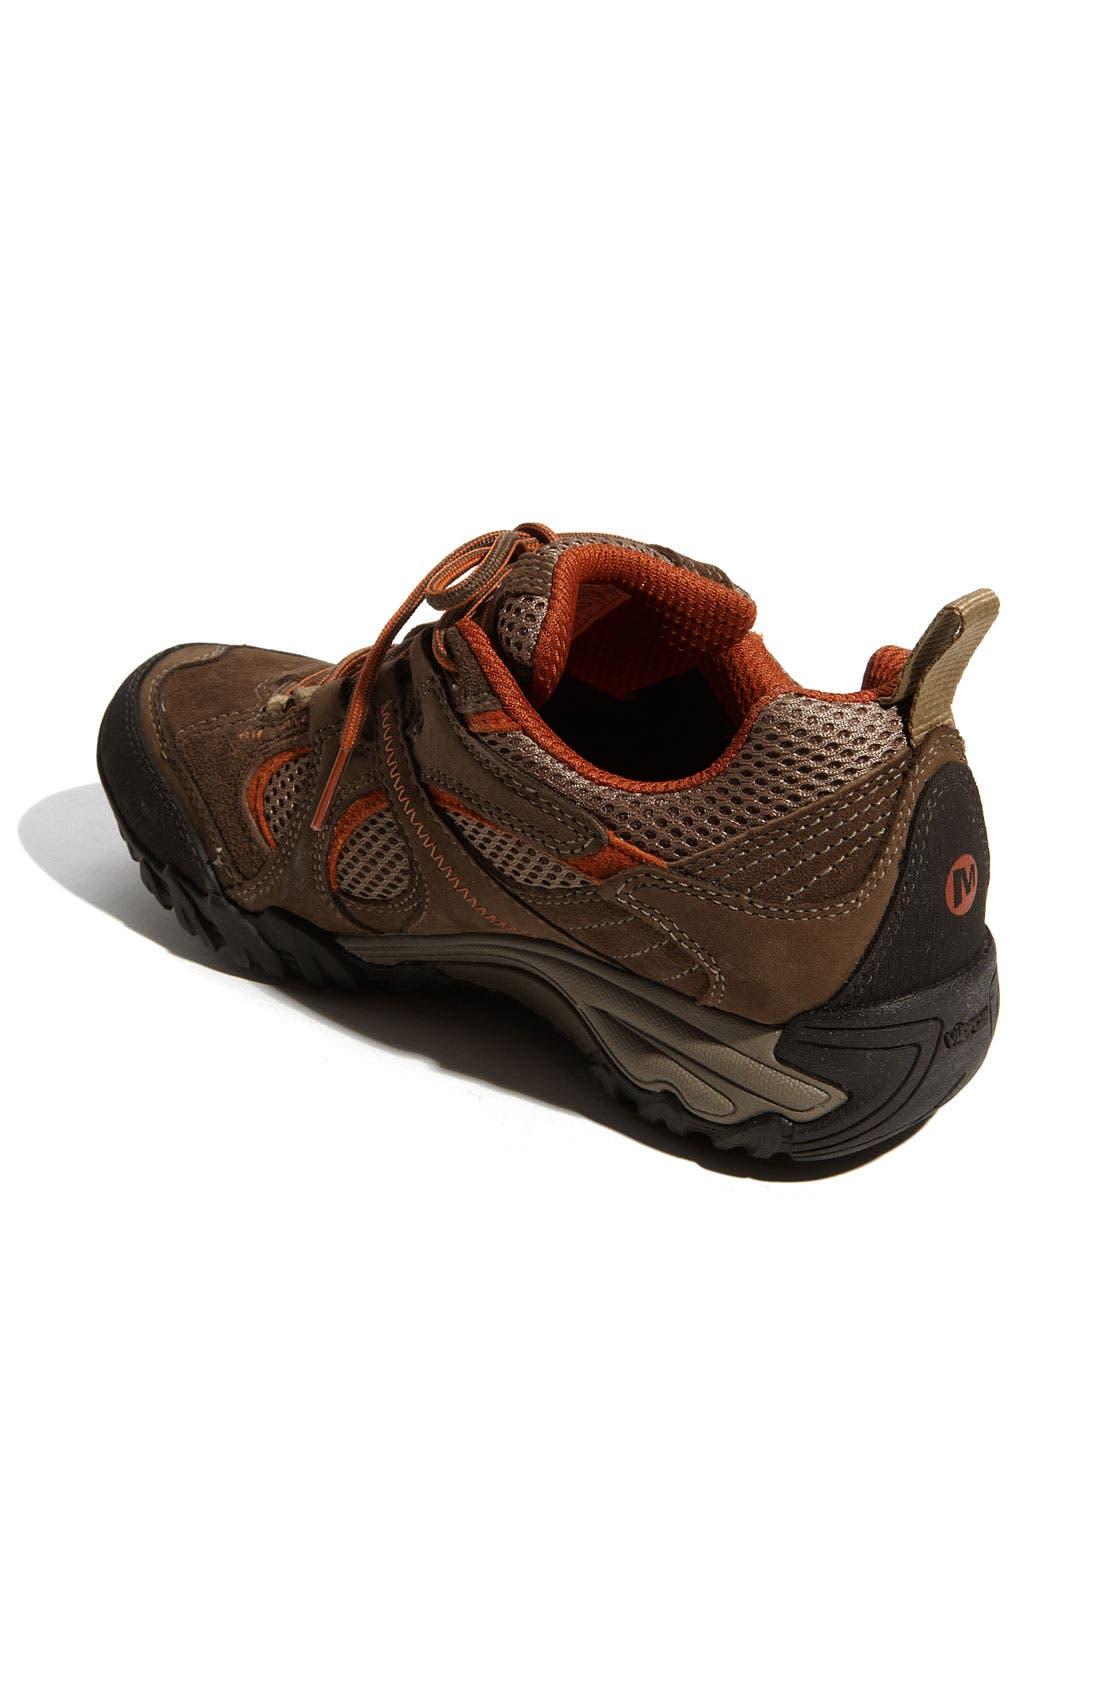 Alternate Image 2  - Merrell 'Chameleon Arc 2 Wind' Gore-Tex® Walking Shoe (Women)